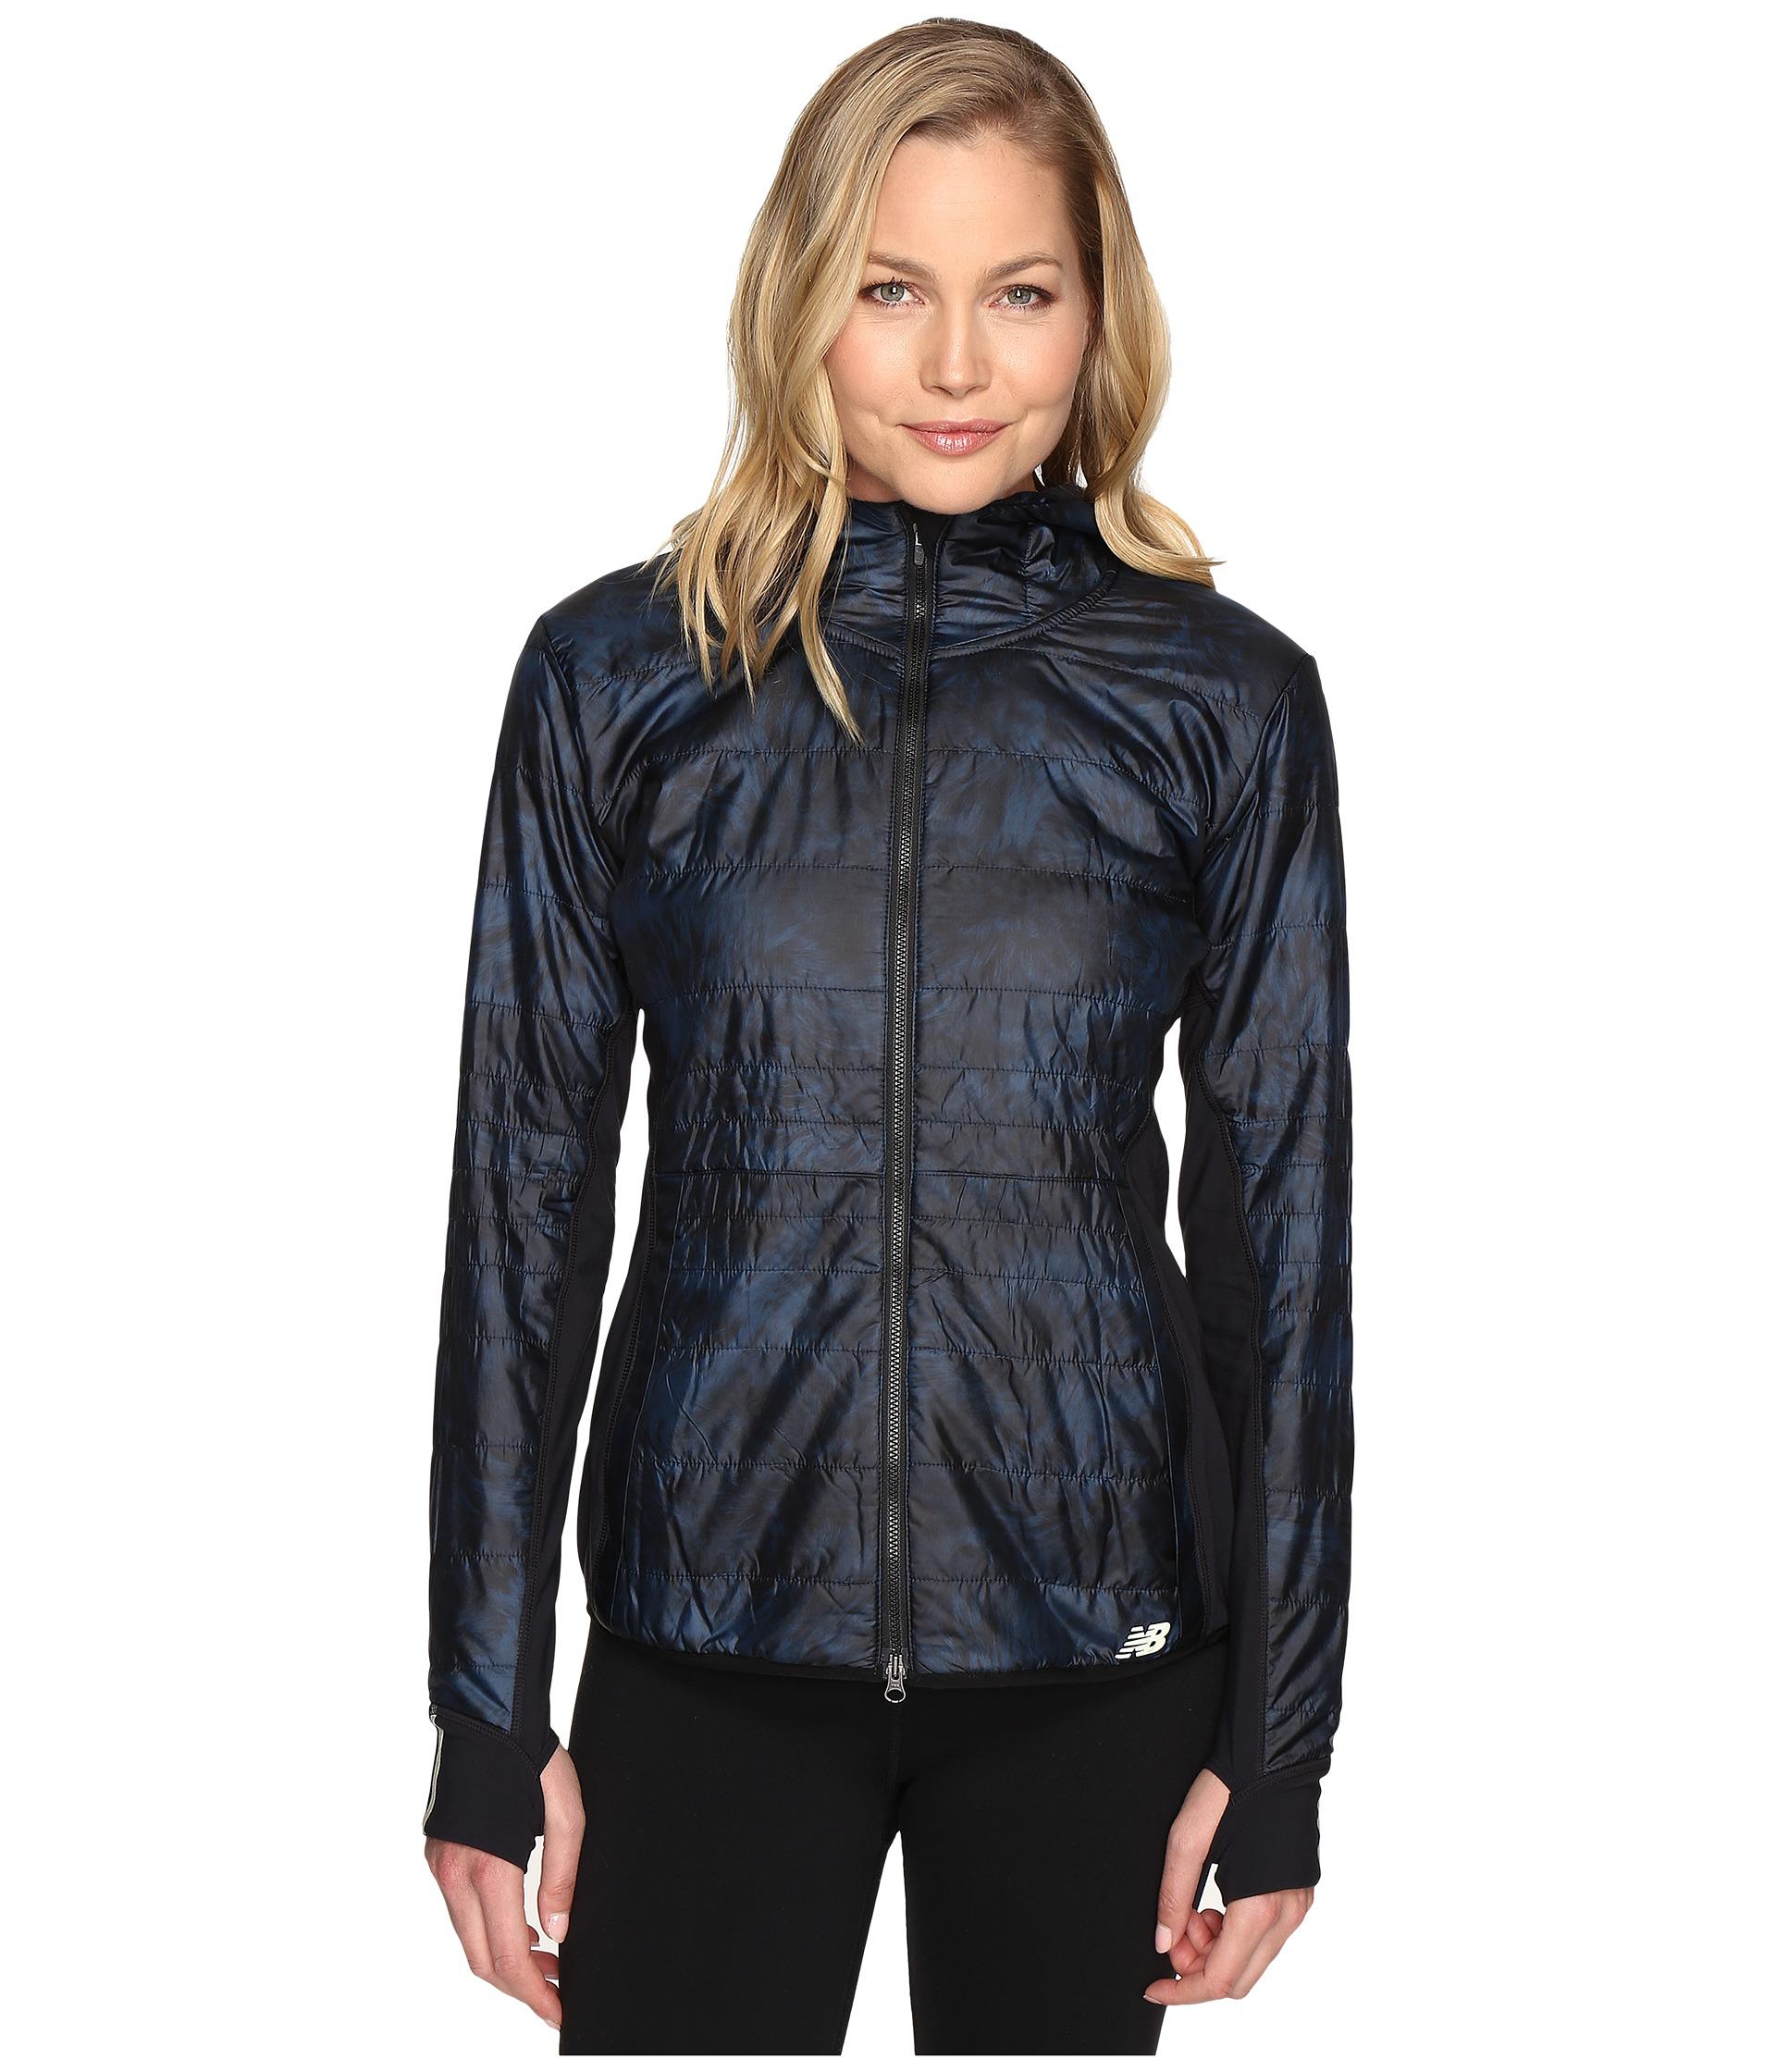 new balance nb heat hybrid jacket free. Black Bedroom Furniture Sets. Home Design Ideas